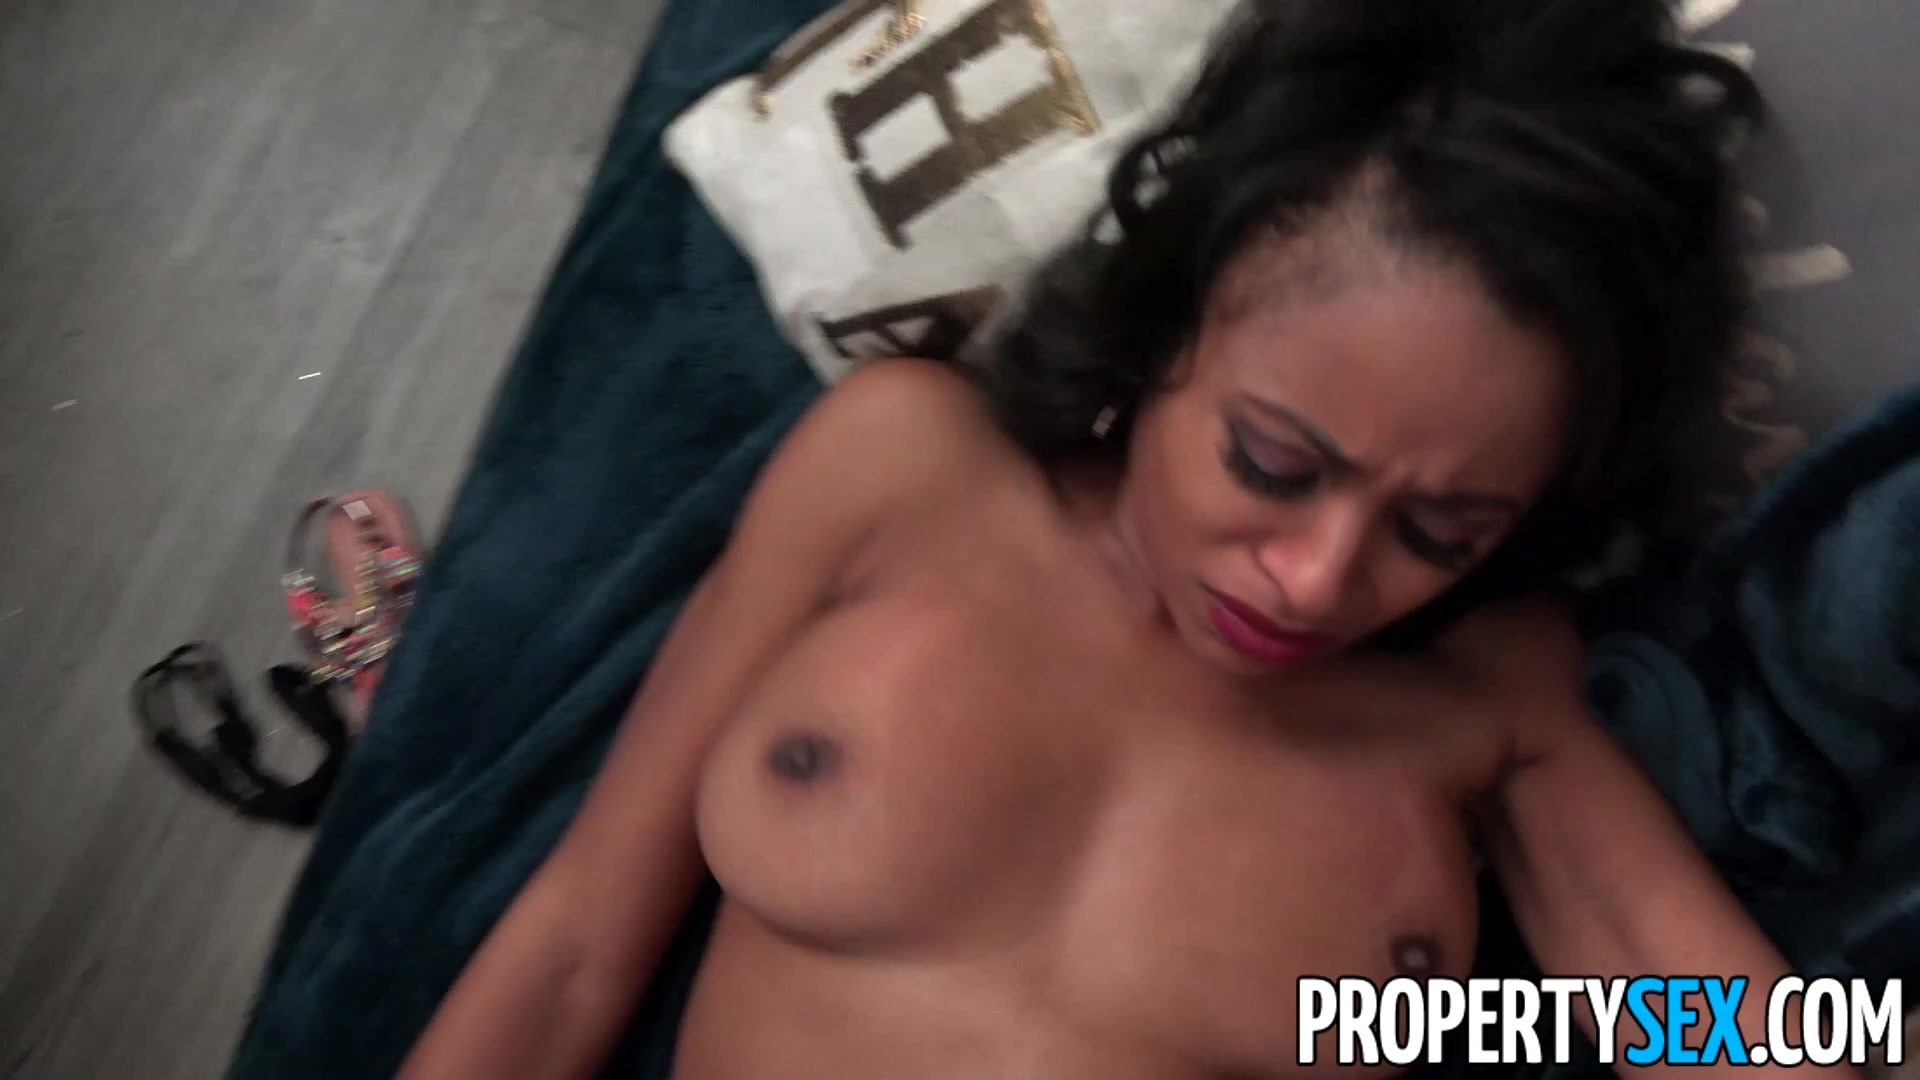 Porn tube Spring break lesbian video